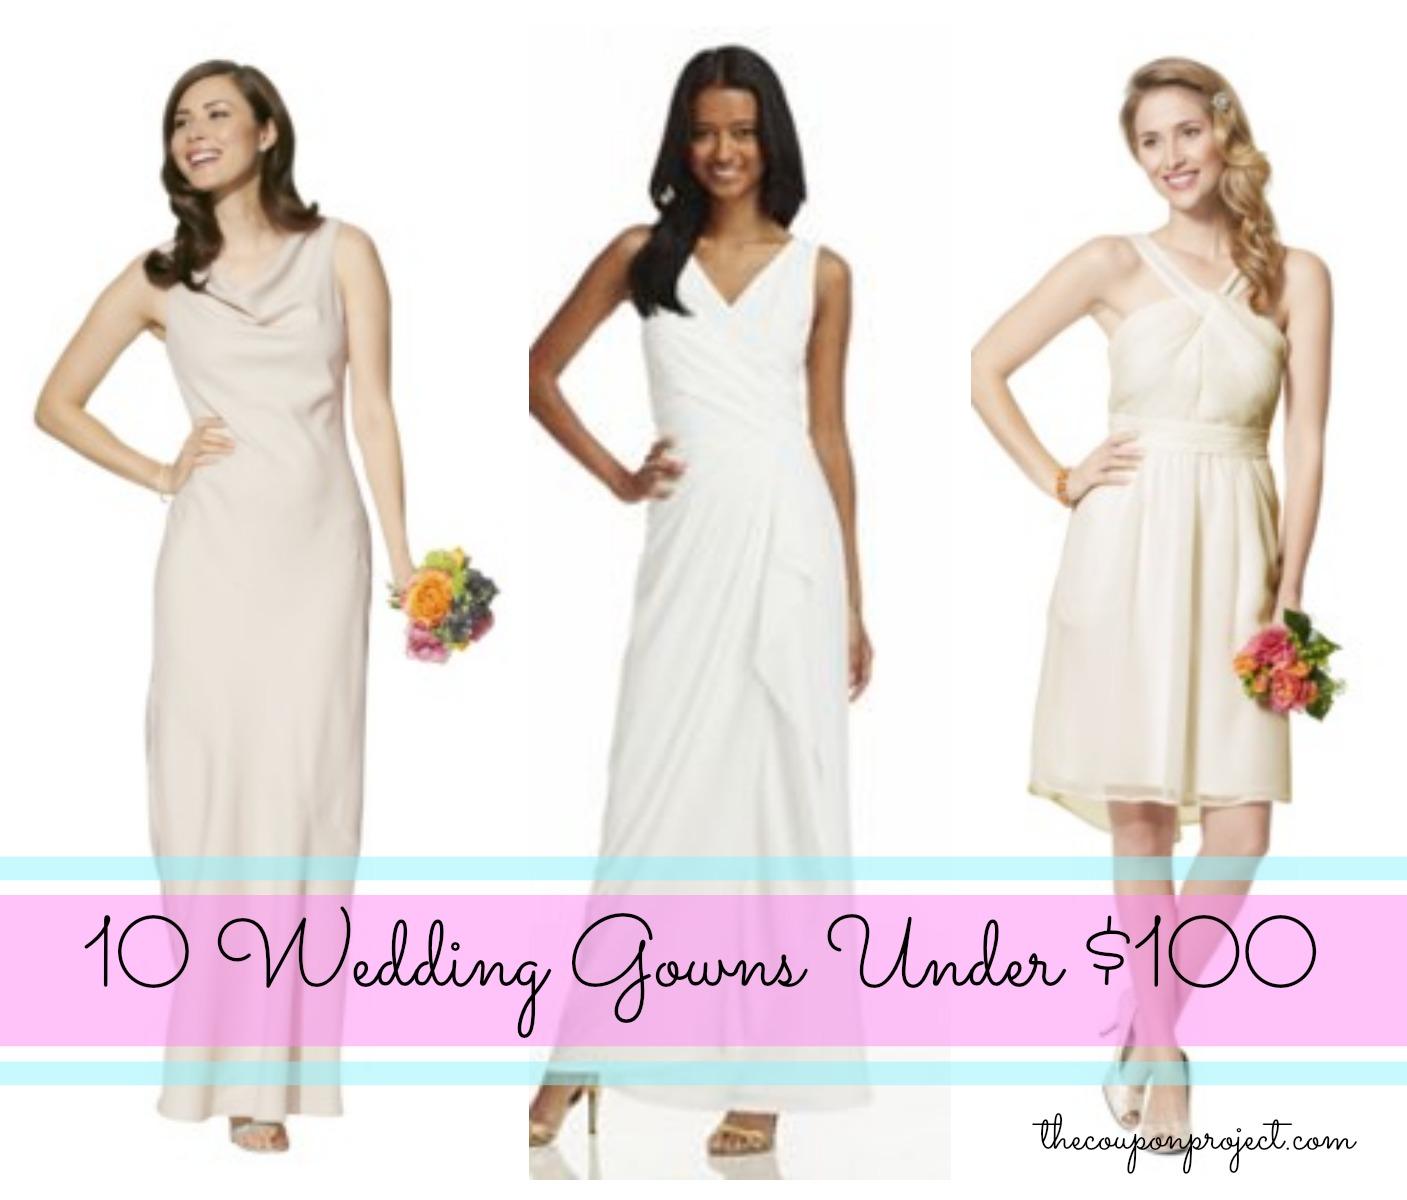 10 Wedding Dresses for under $100